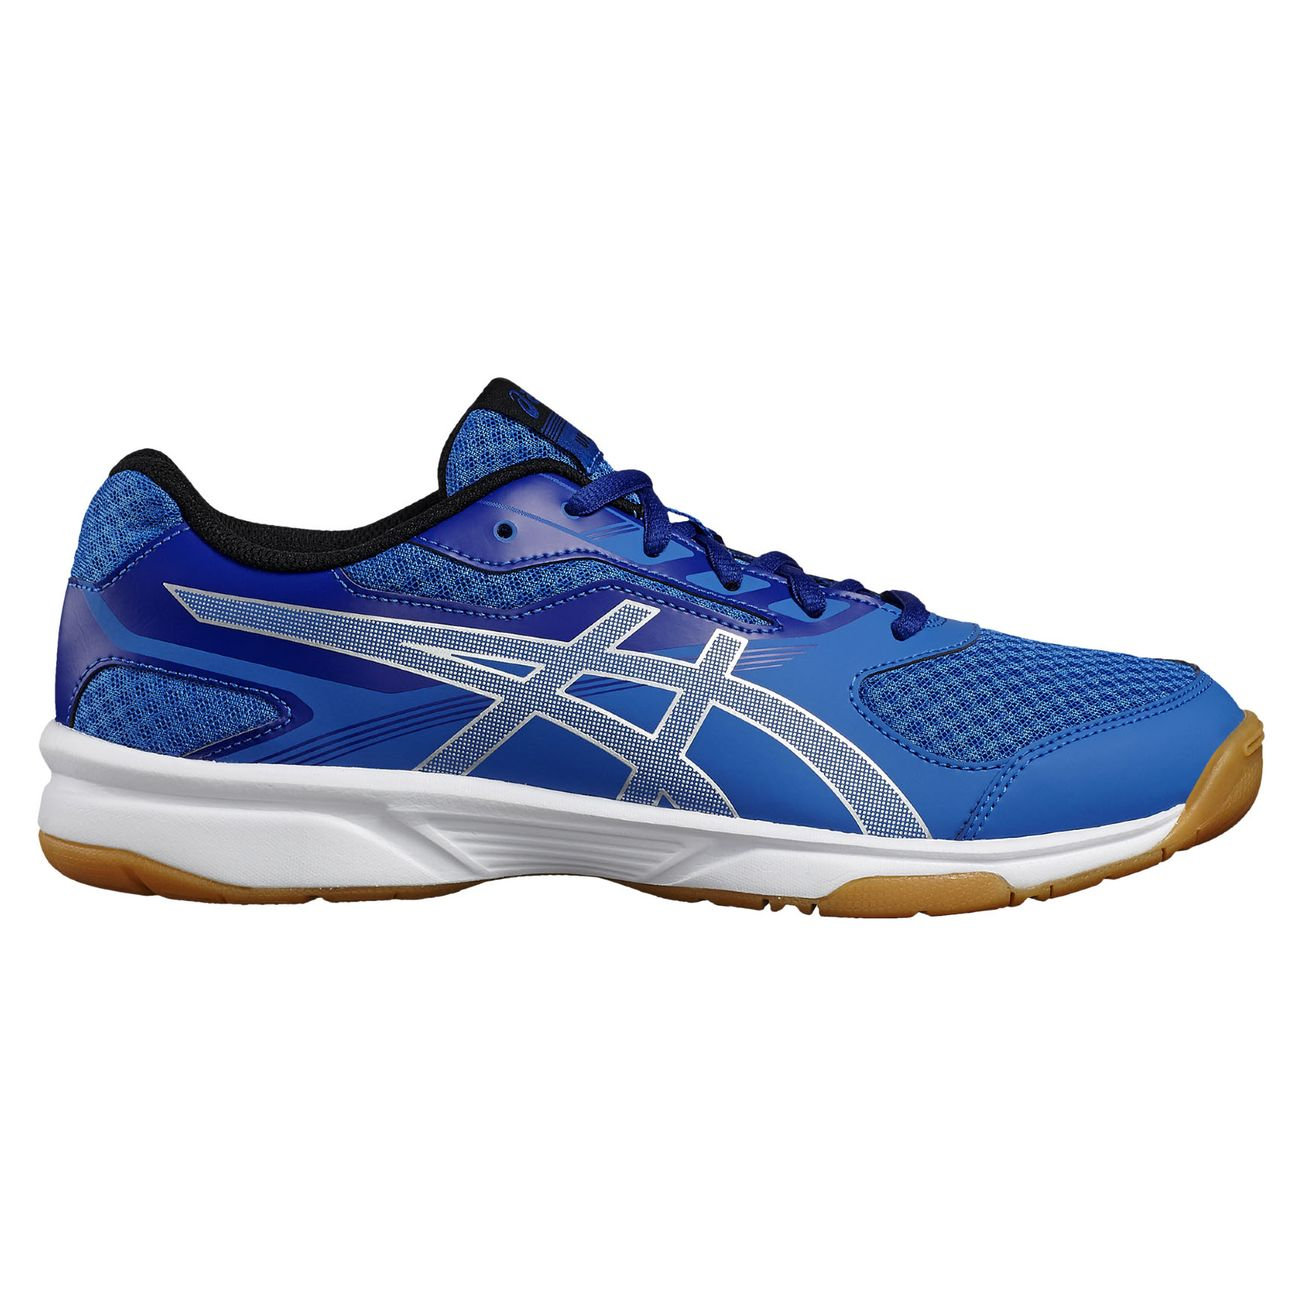 Volley ball homme ASICS Chaussures Asics Upcourt 2